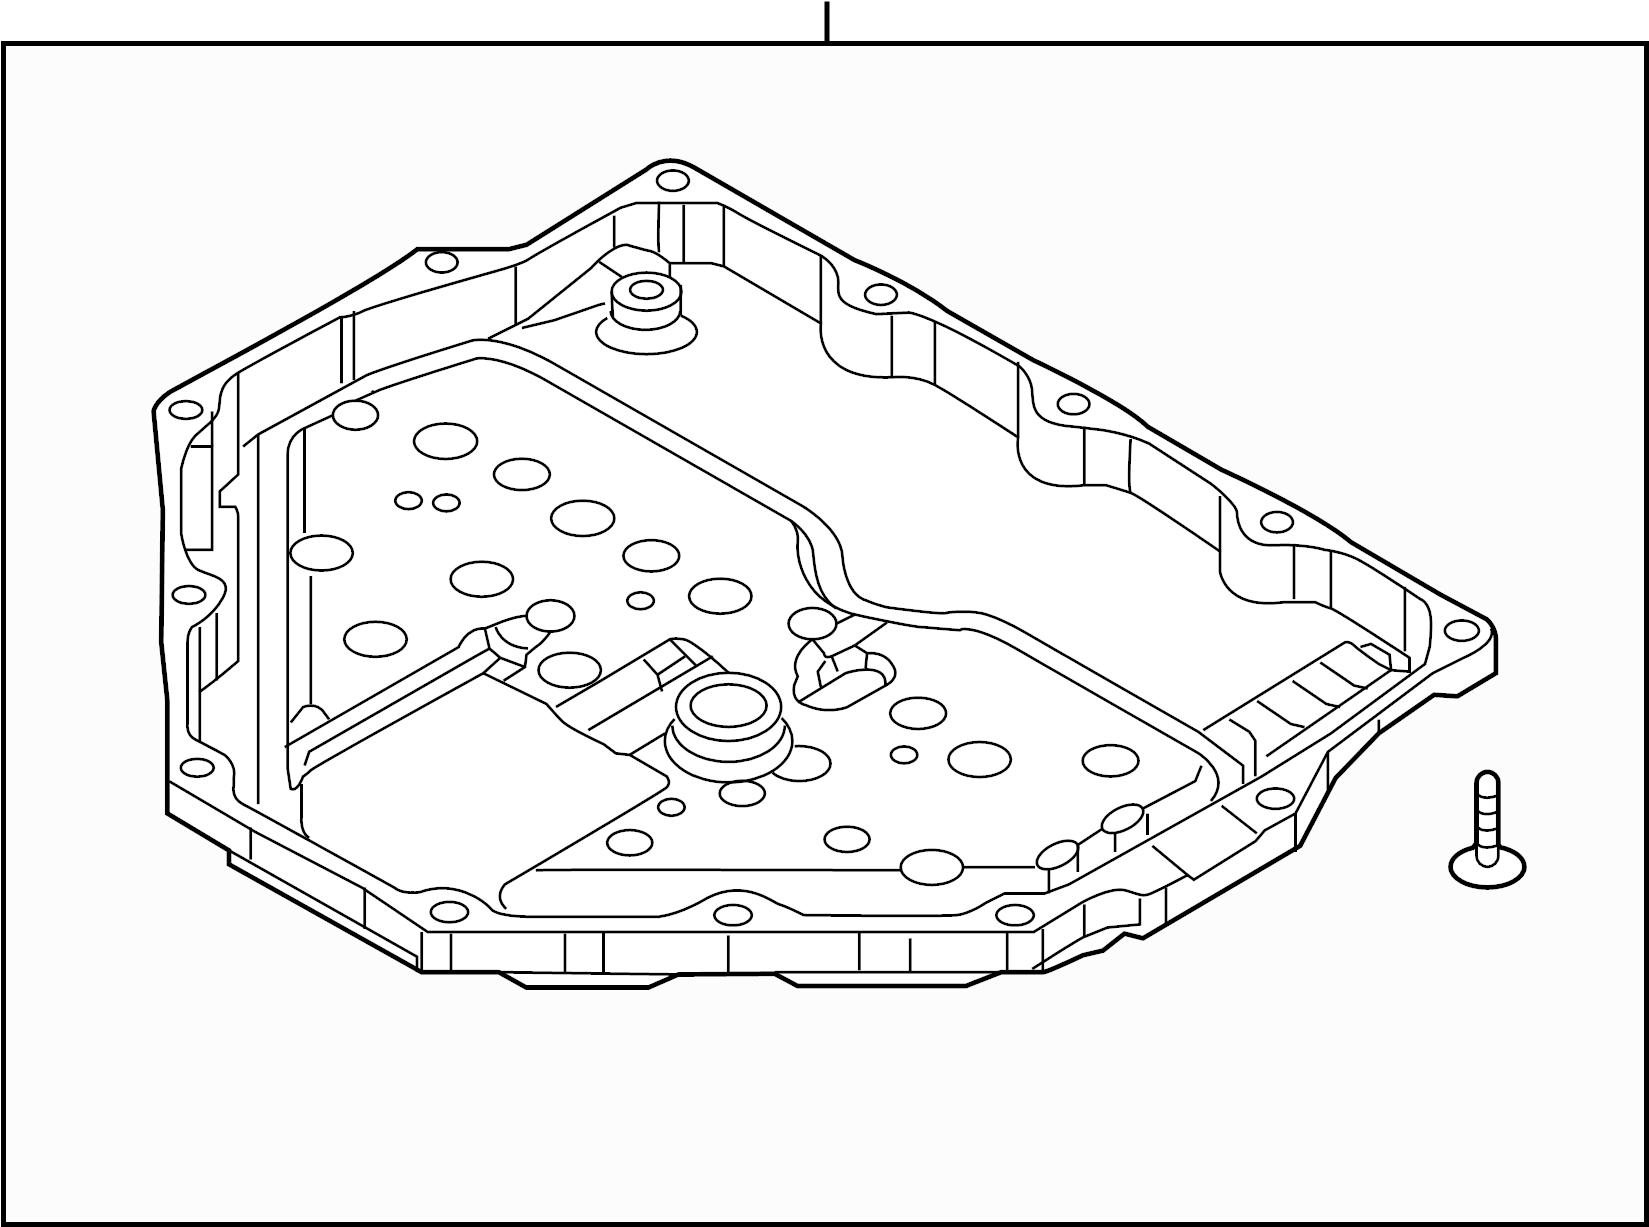 4r70w Oil Diagram - Wiring Diagrams Schema